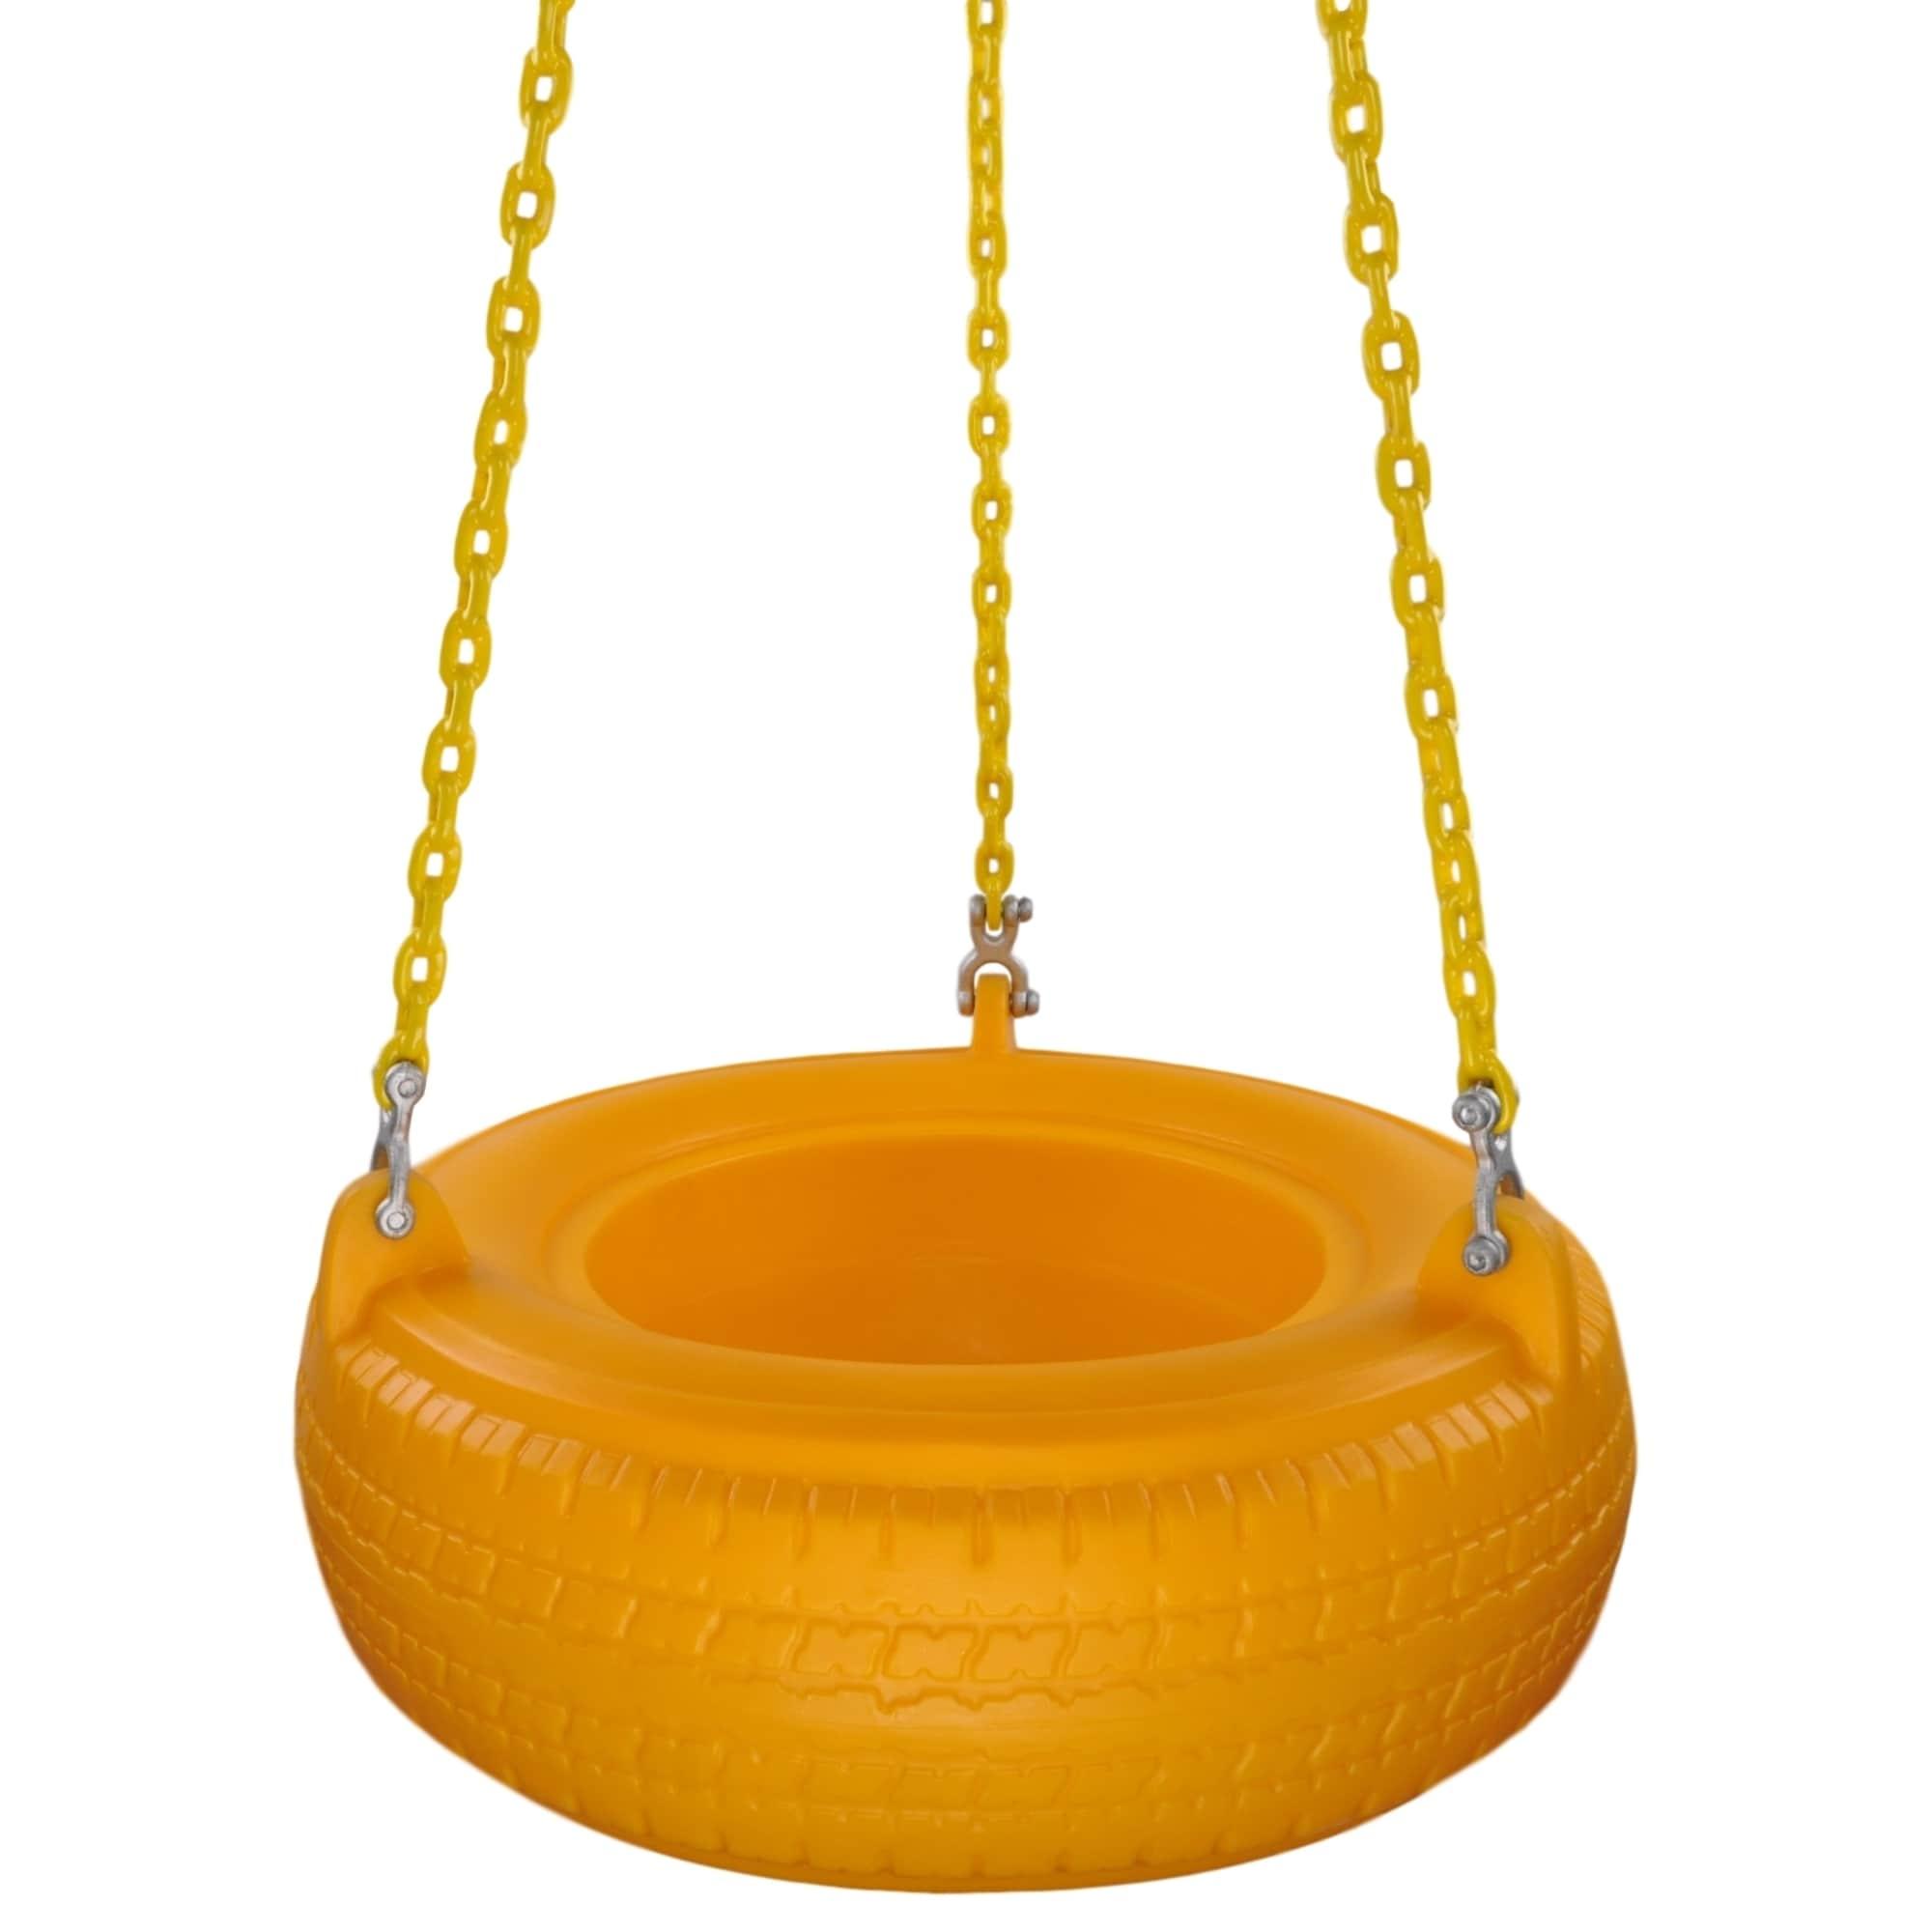 Shop Swing Set Stuff Inc Plastic Tire With Coated Chain Free